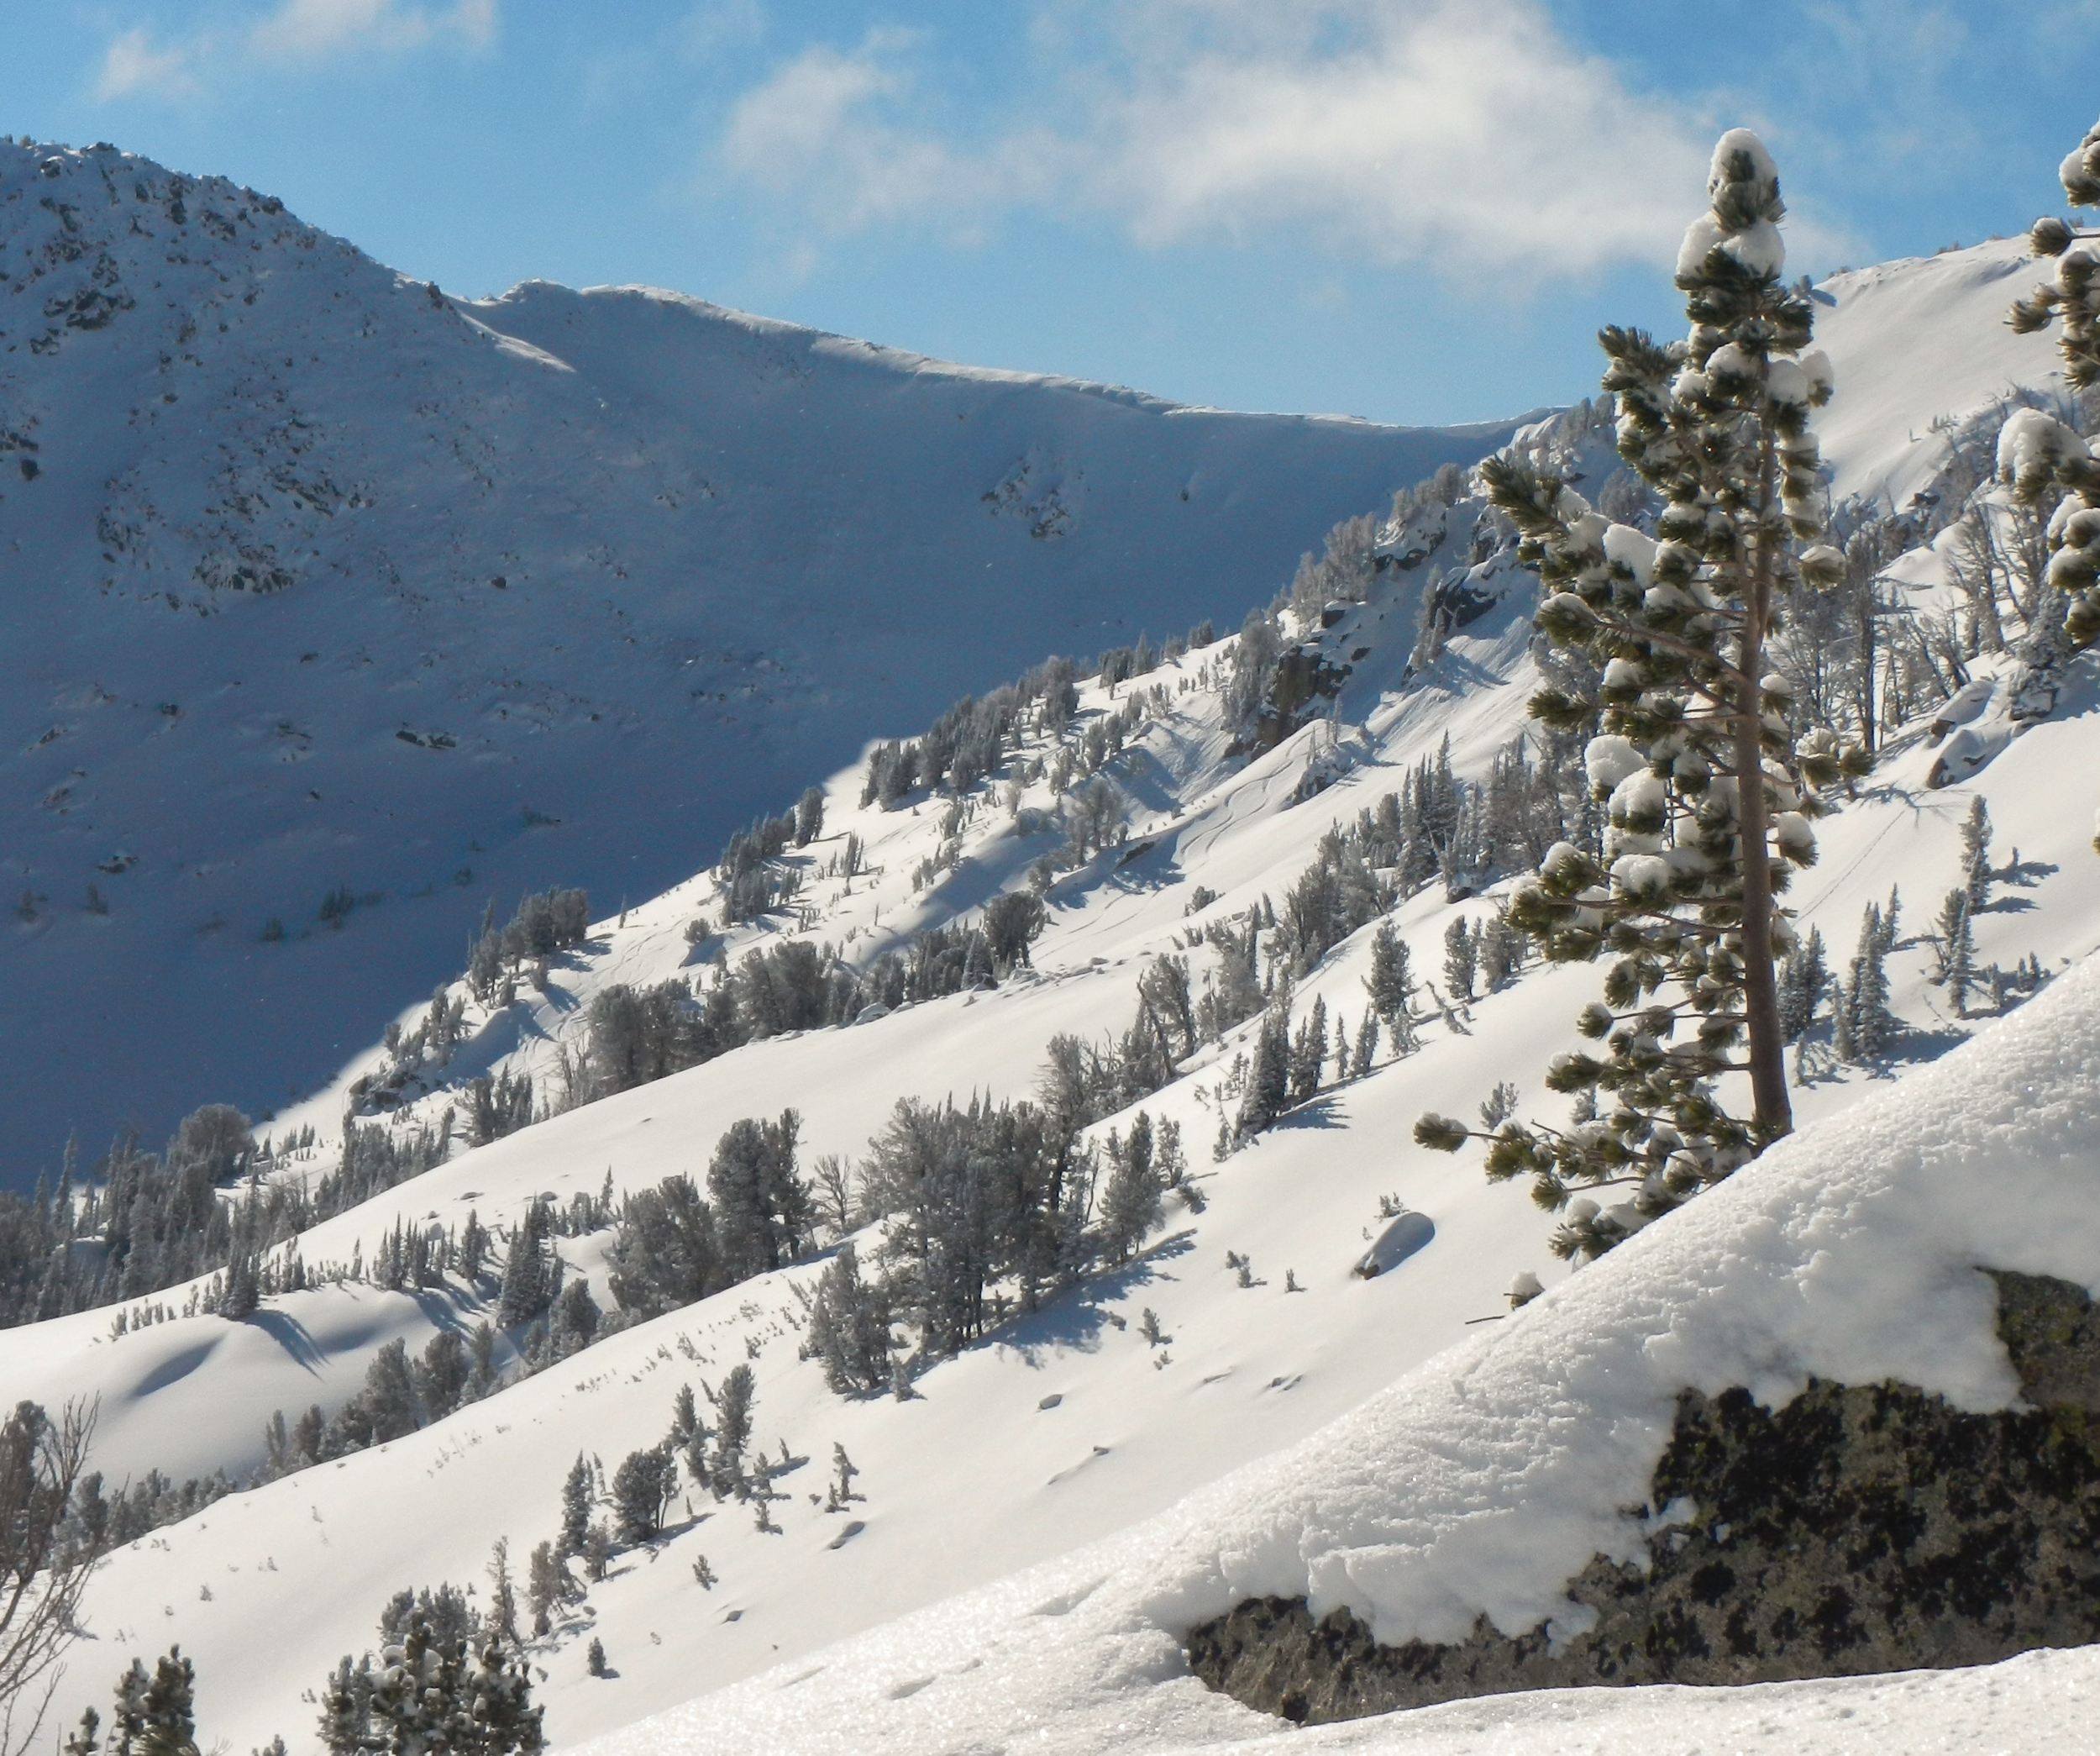 Backcountry ski terrain for every taste and ability.